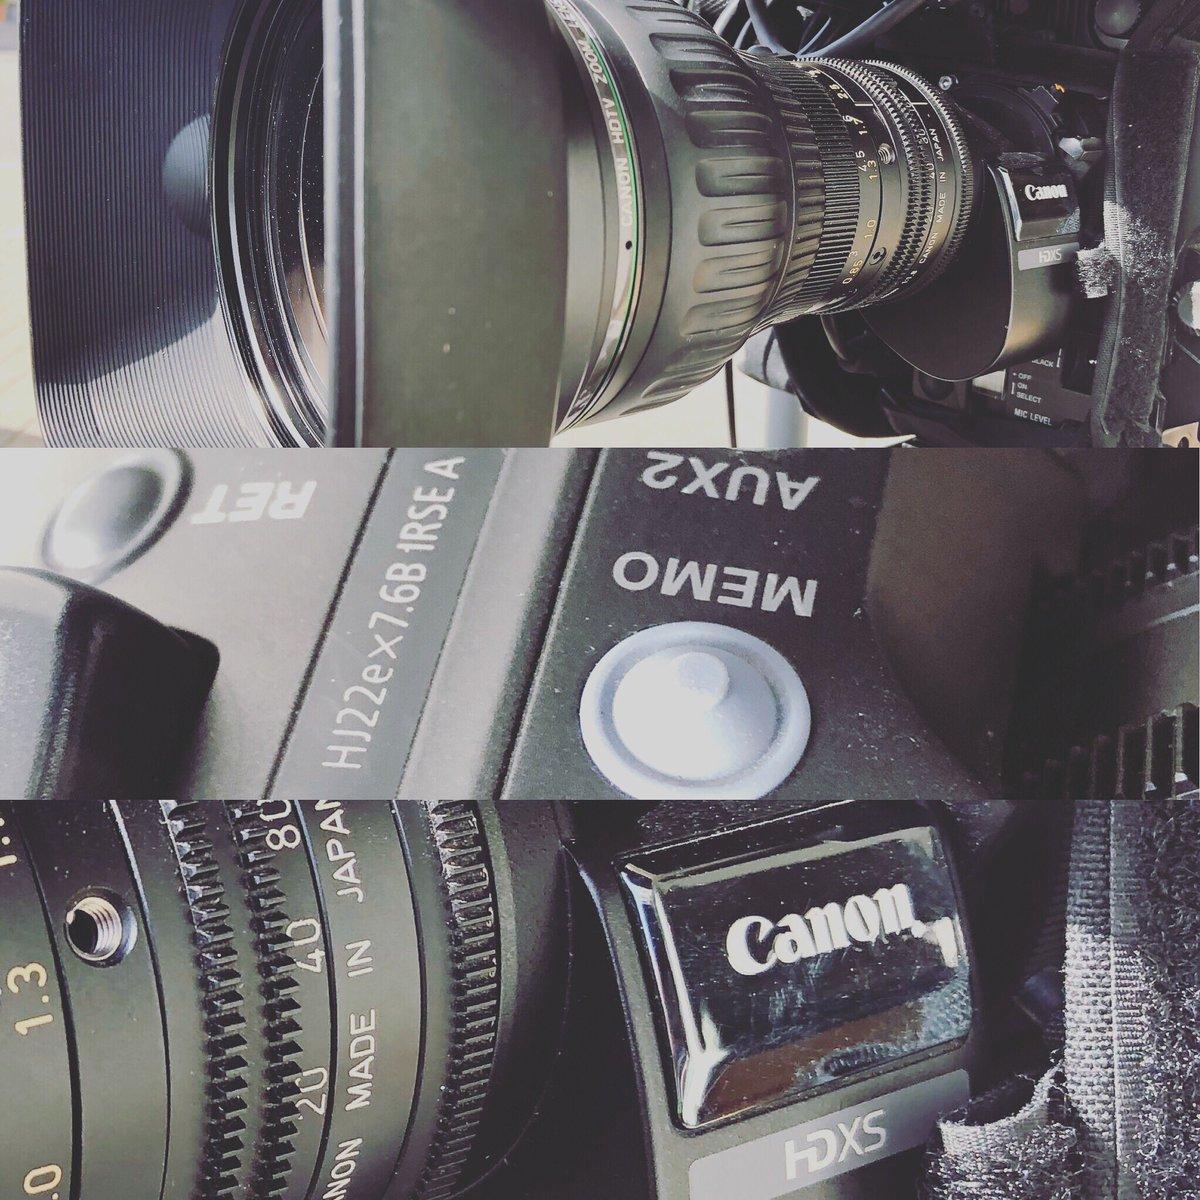 New kit.... just added a new Canon #HJ22 to my kit list. #freelance #cameraman #cameraoperator #dorset #devon #somerset #tv #news #broadcast #live #streaming